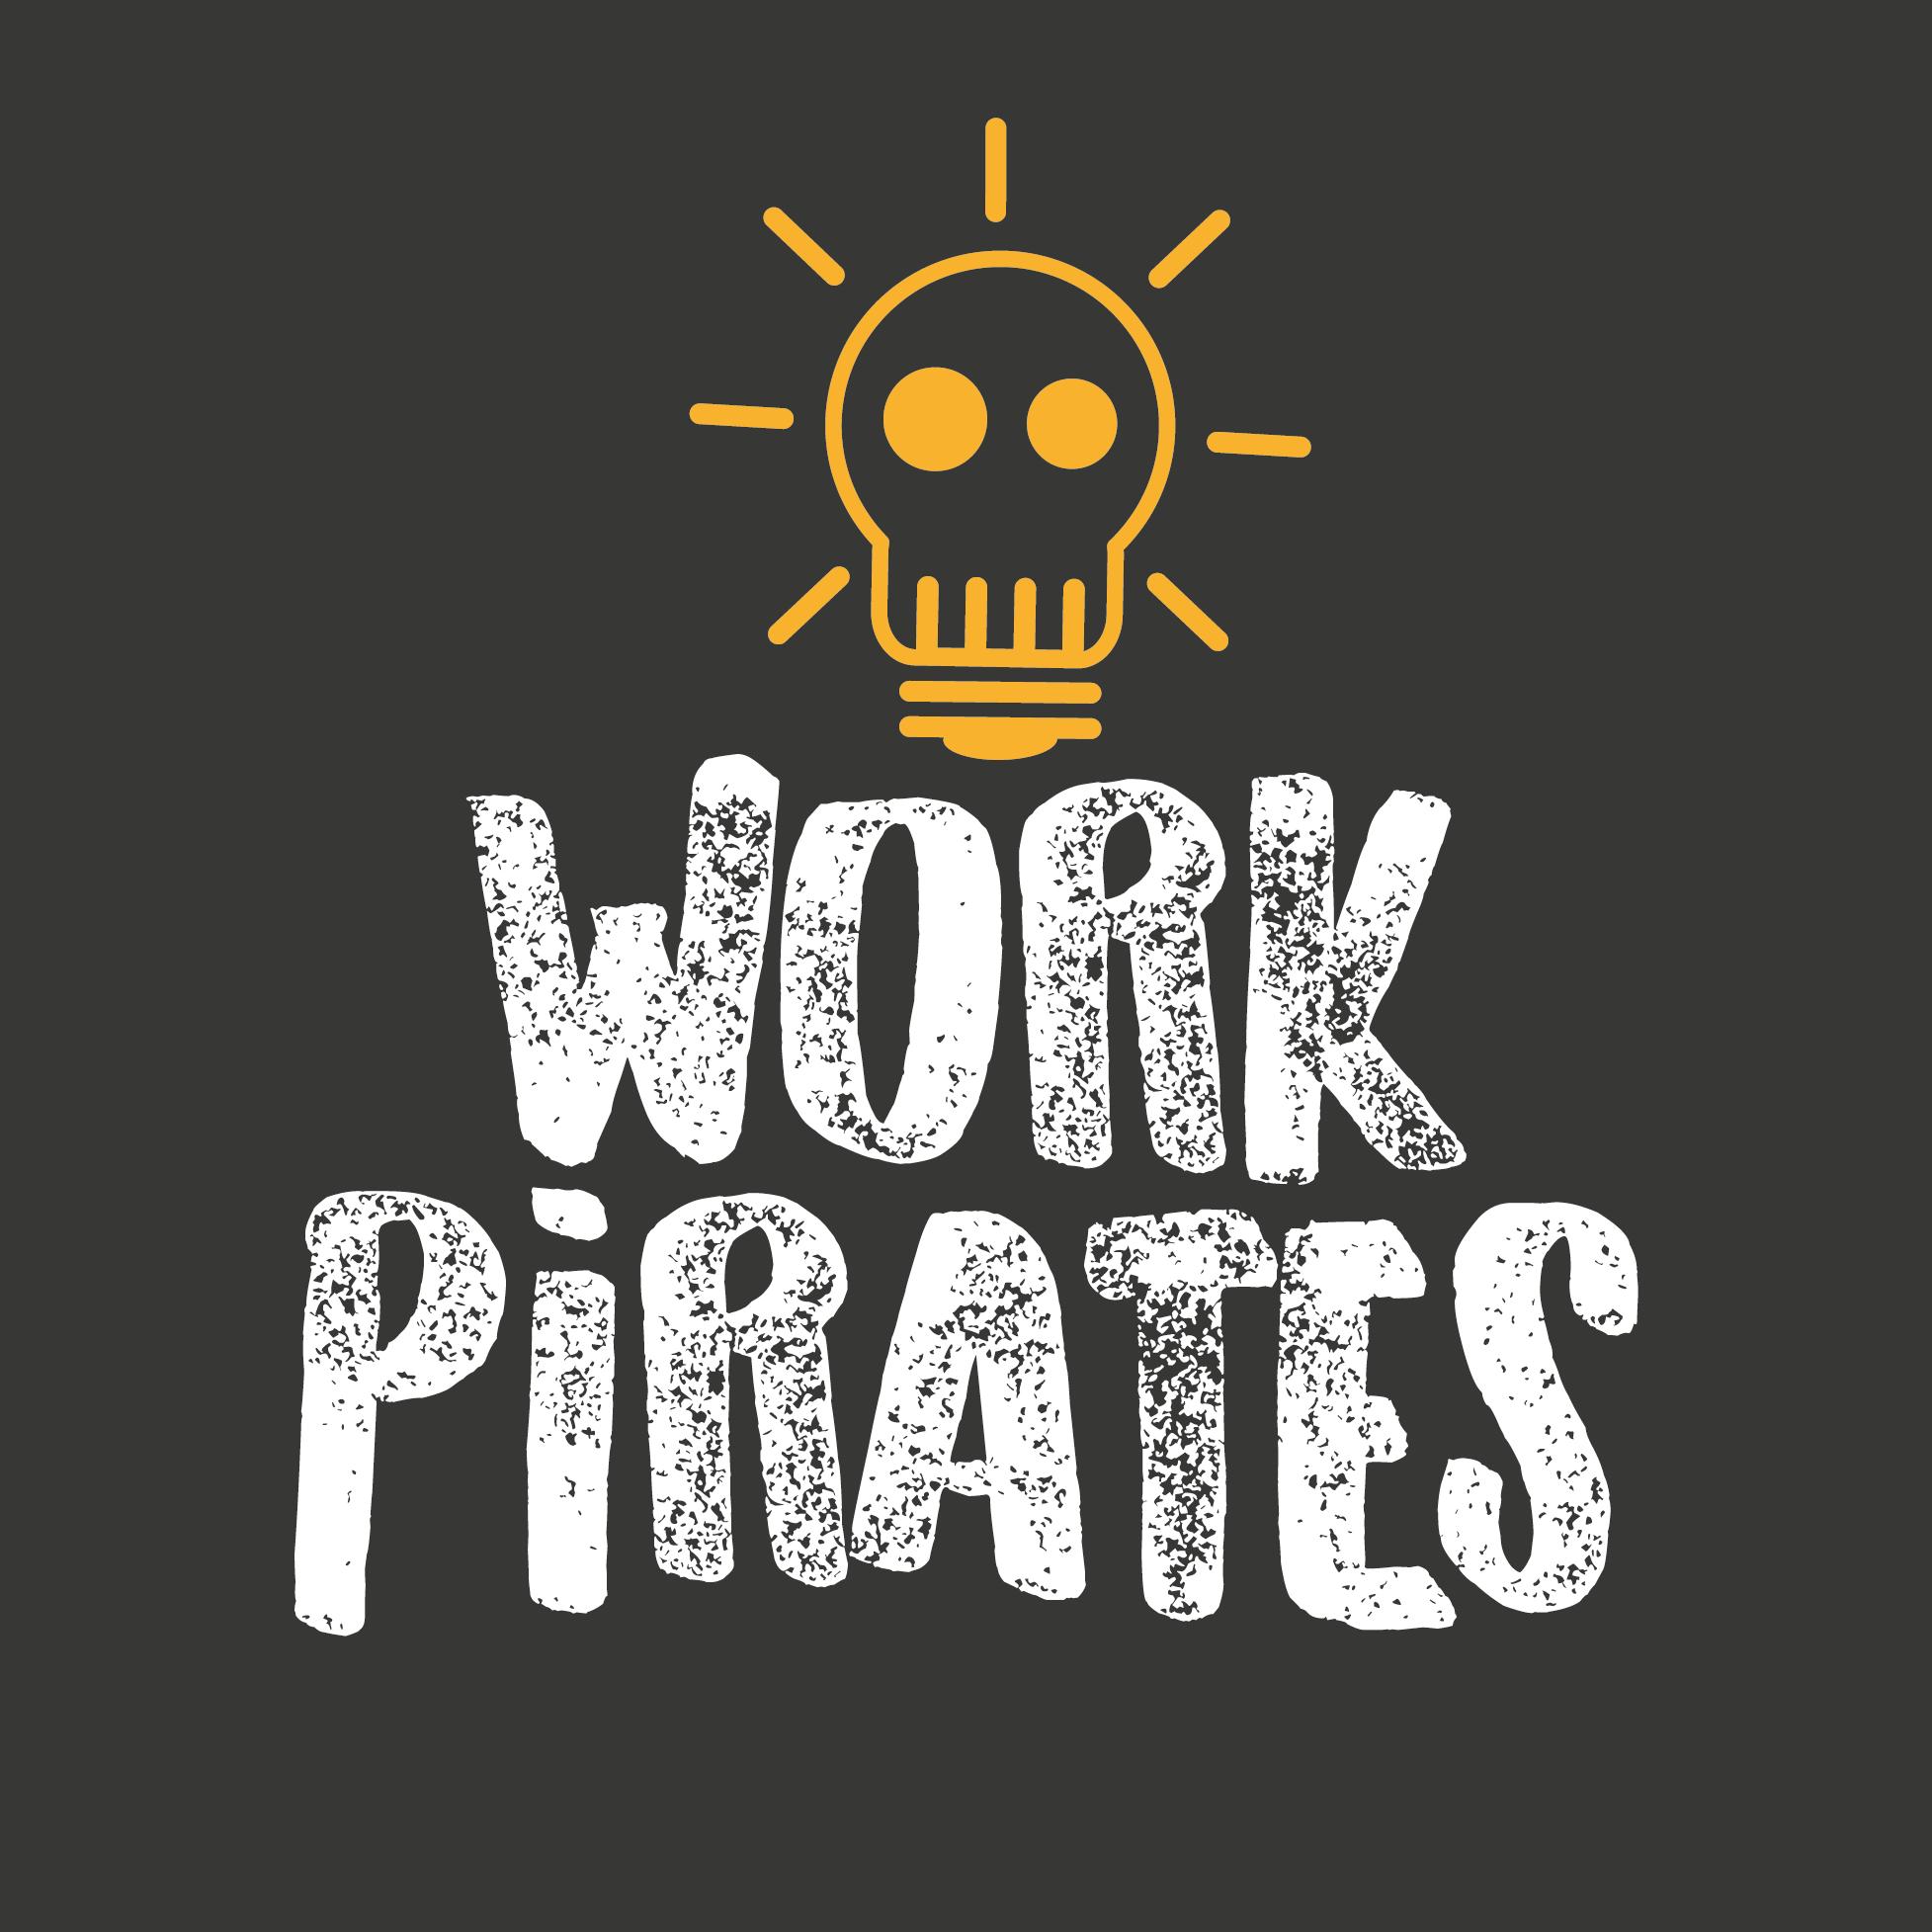 Work Pirates Logo (The Skulb)